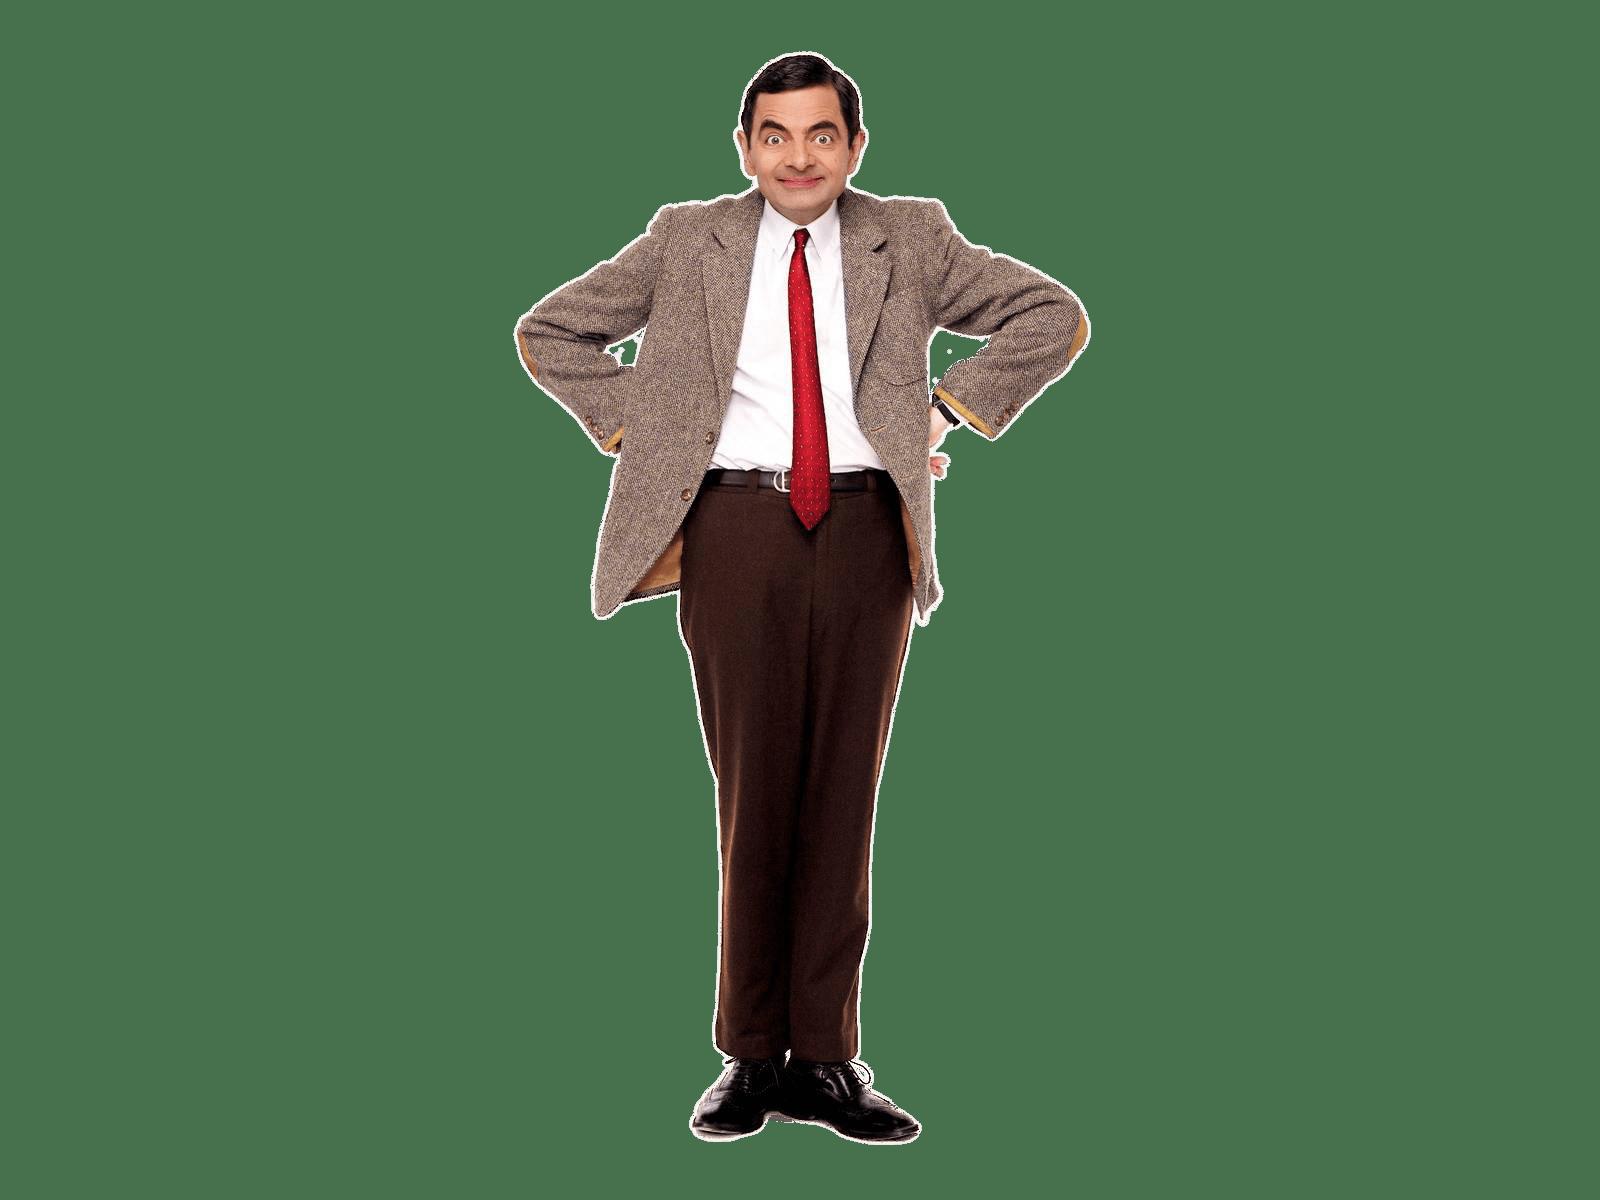 Mr Bean Rowan Atkinson Png Image Mr Bean British Sitcoms Mr